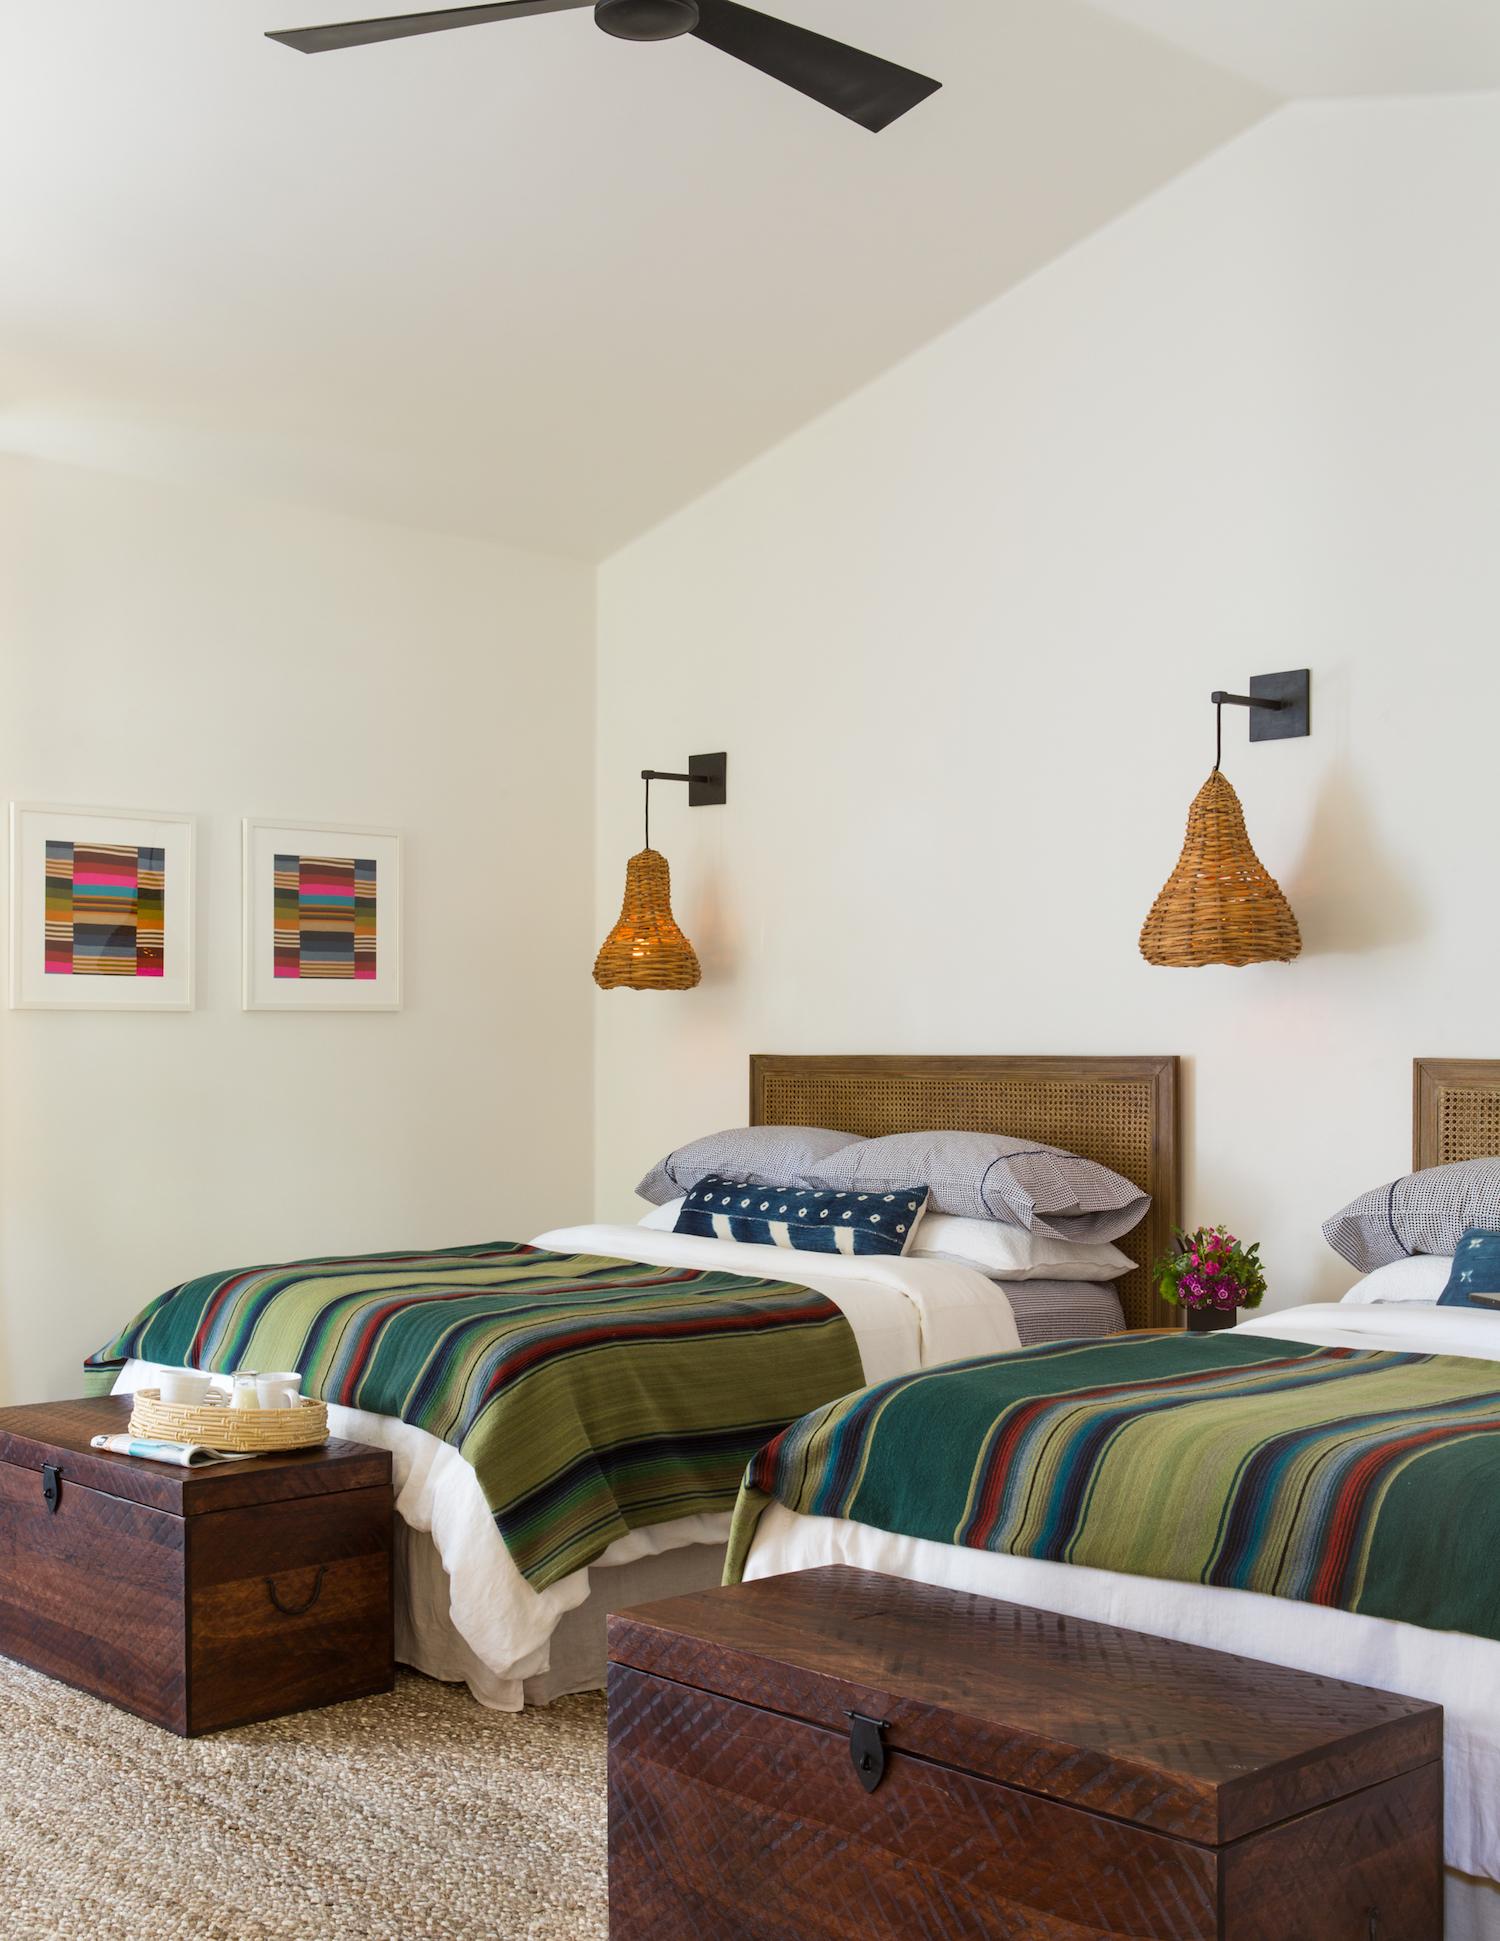 Natural Materials 101 By Alison Davin Of Jute Interior Design Rue